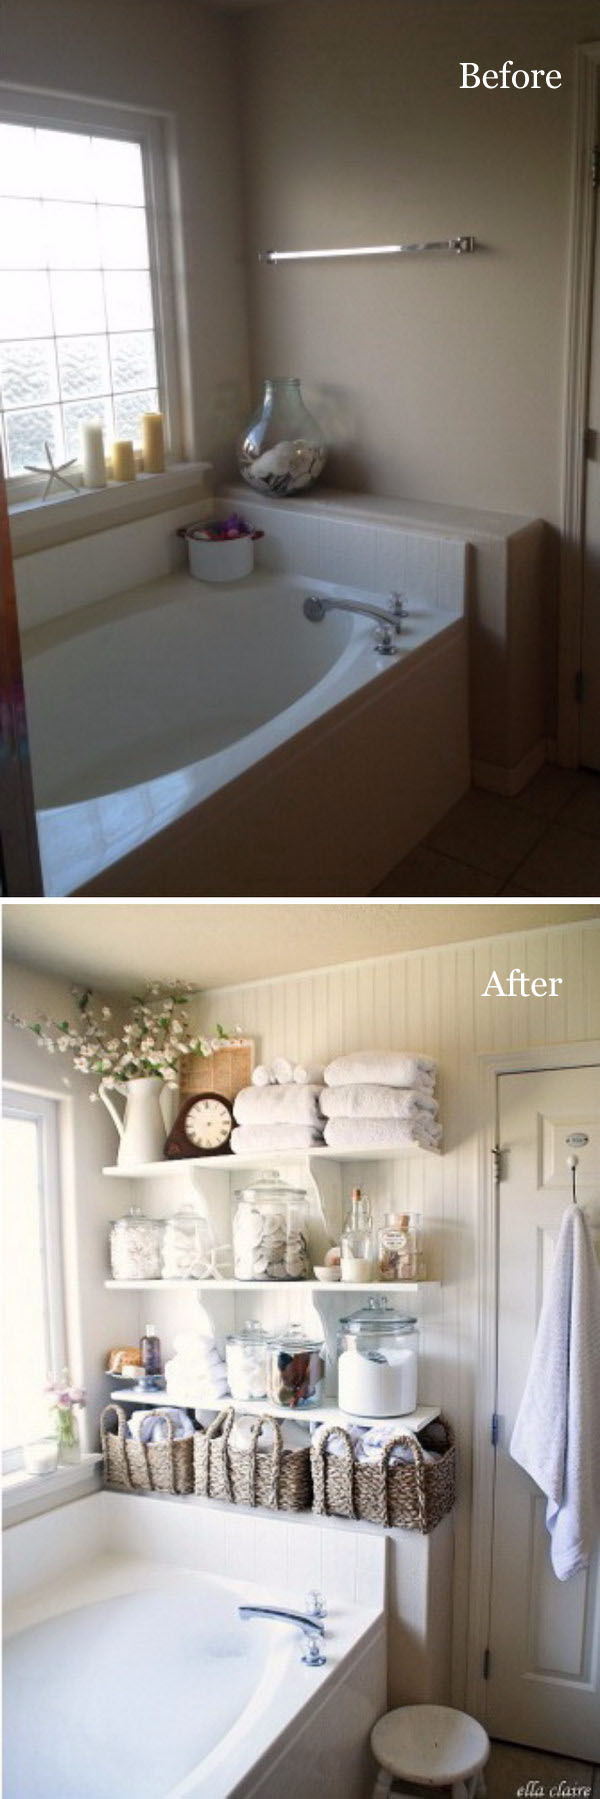 DIY Bathroom Linen Shelves.